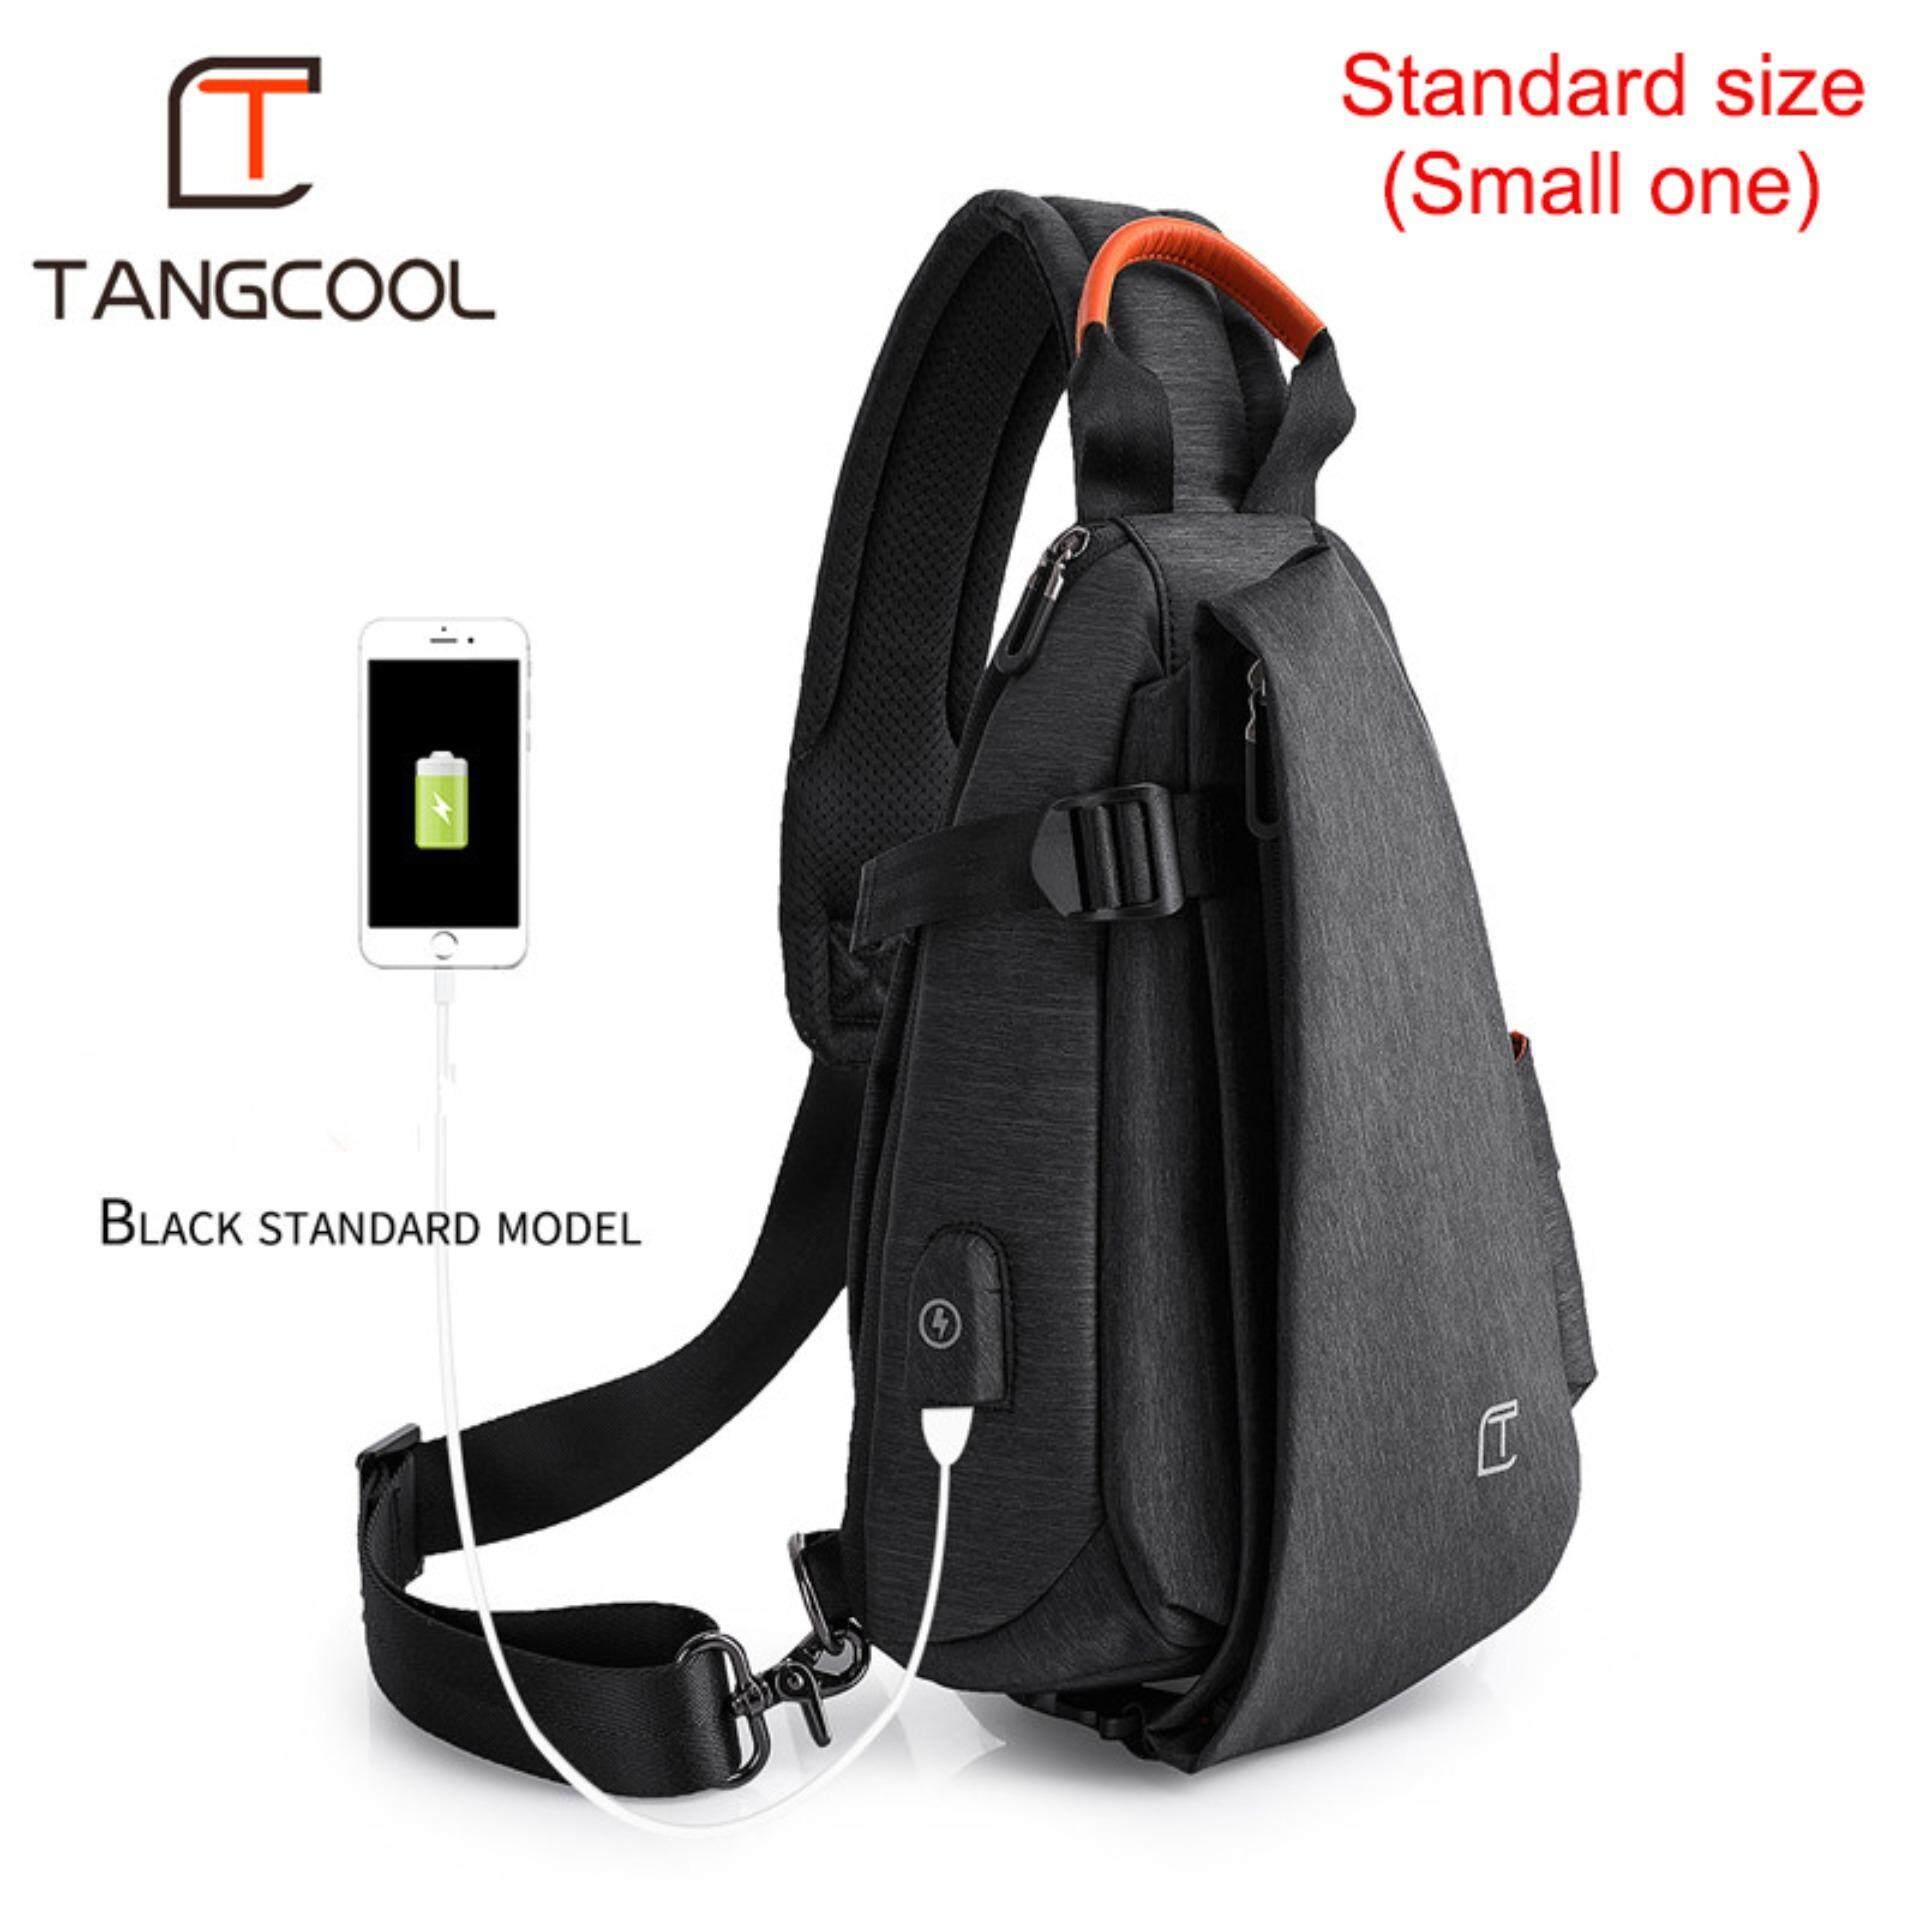 cfe93ce2a TANGCOOL Men Large Capacity Crossbody Bag Big Shoulder Bag Waterproof Chest  Bag Sling Bag